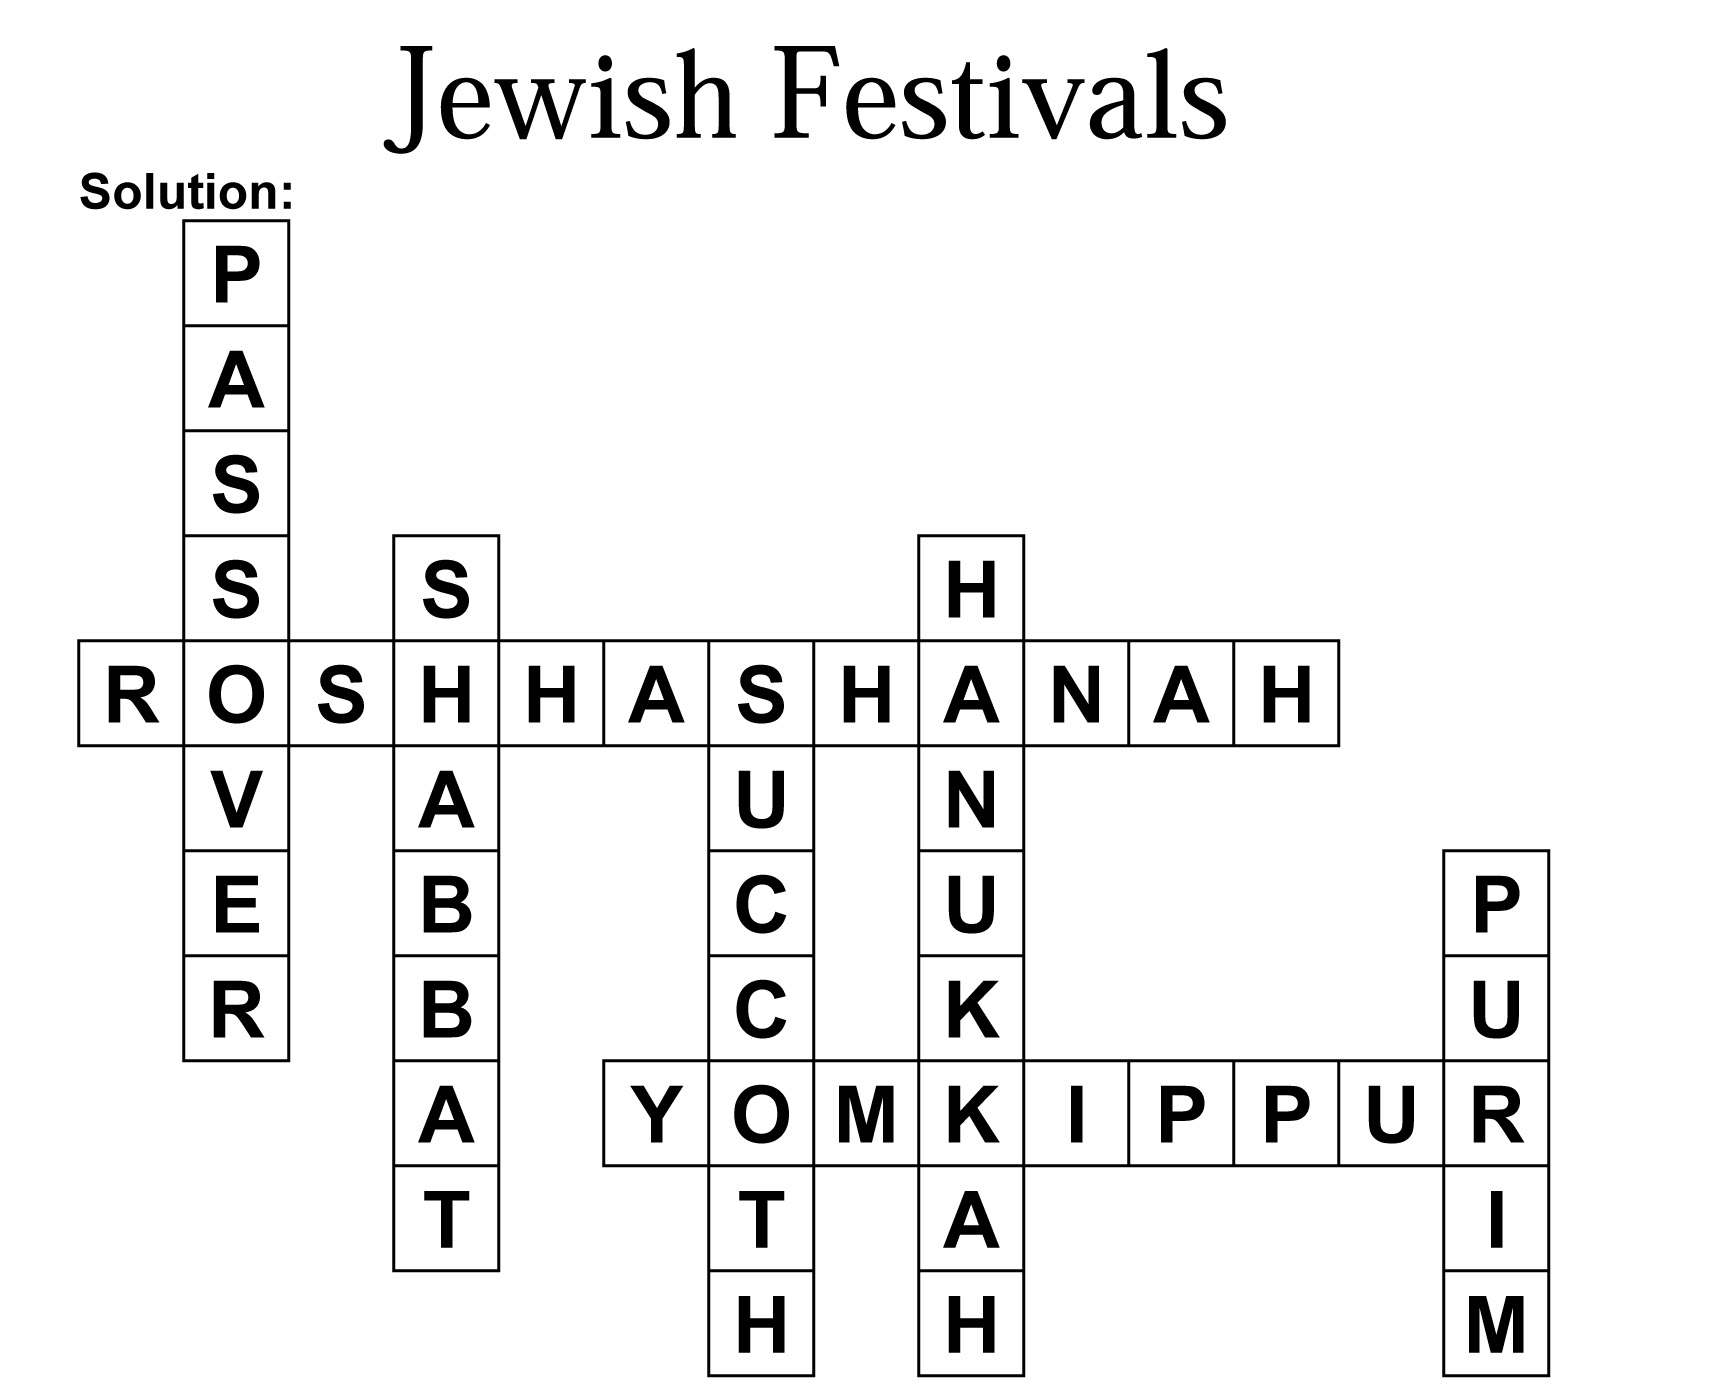 Jewish Festivals Crossword